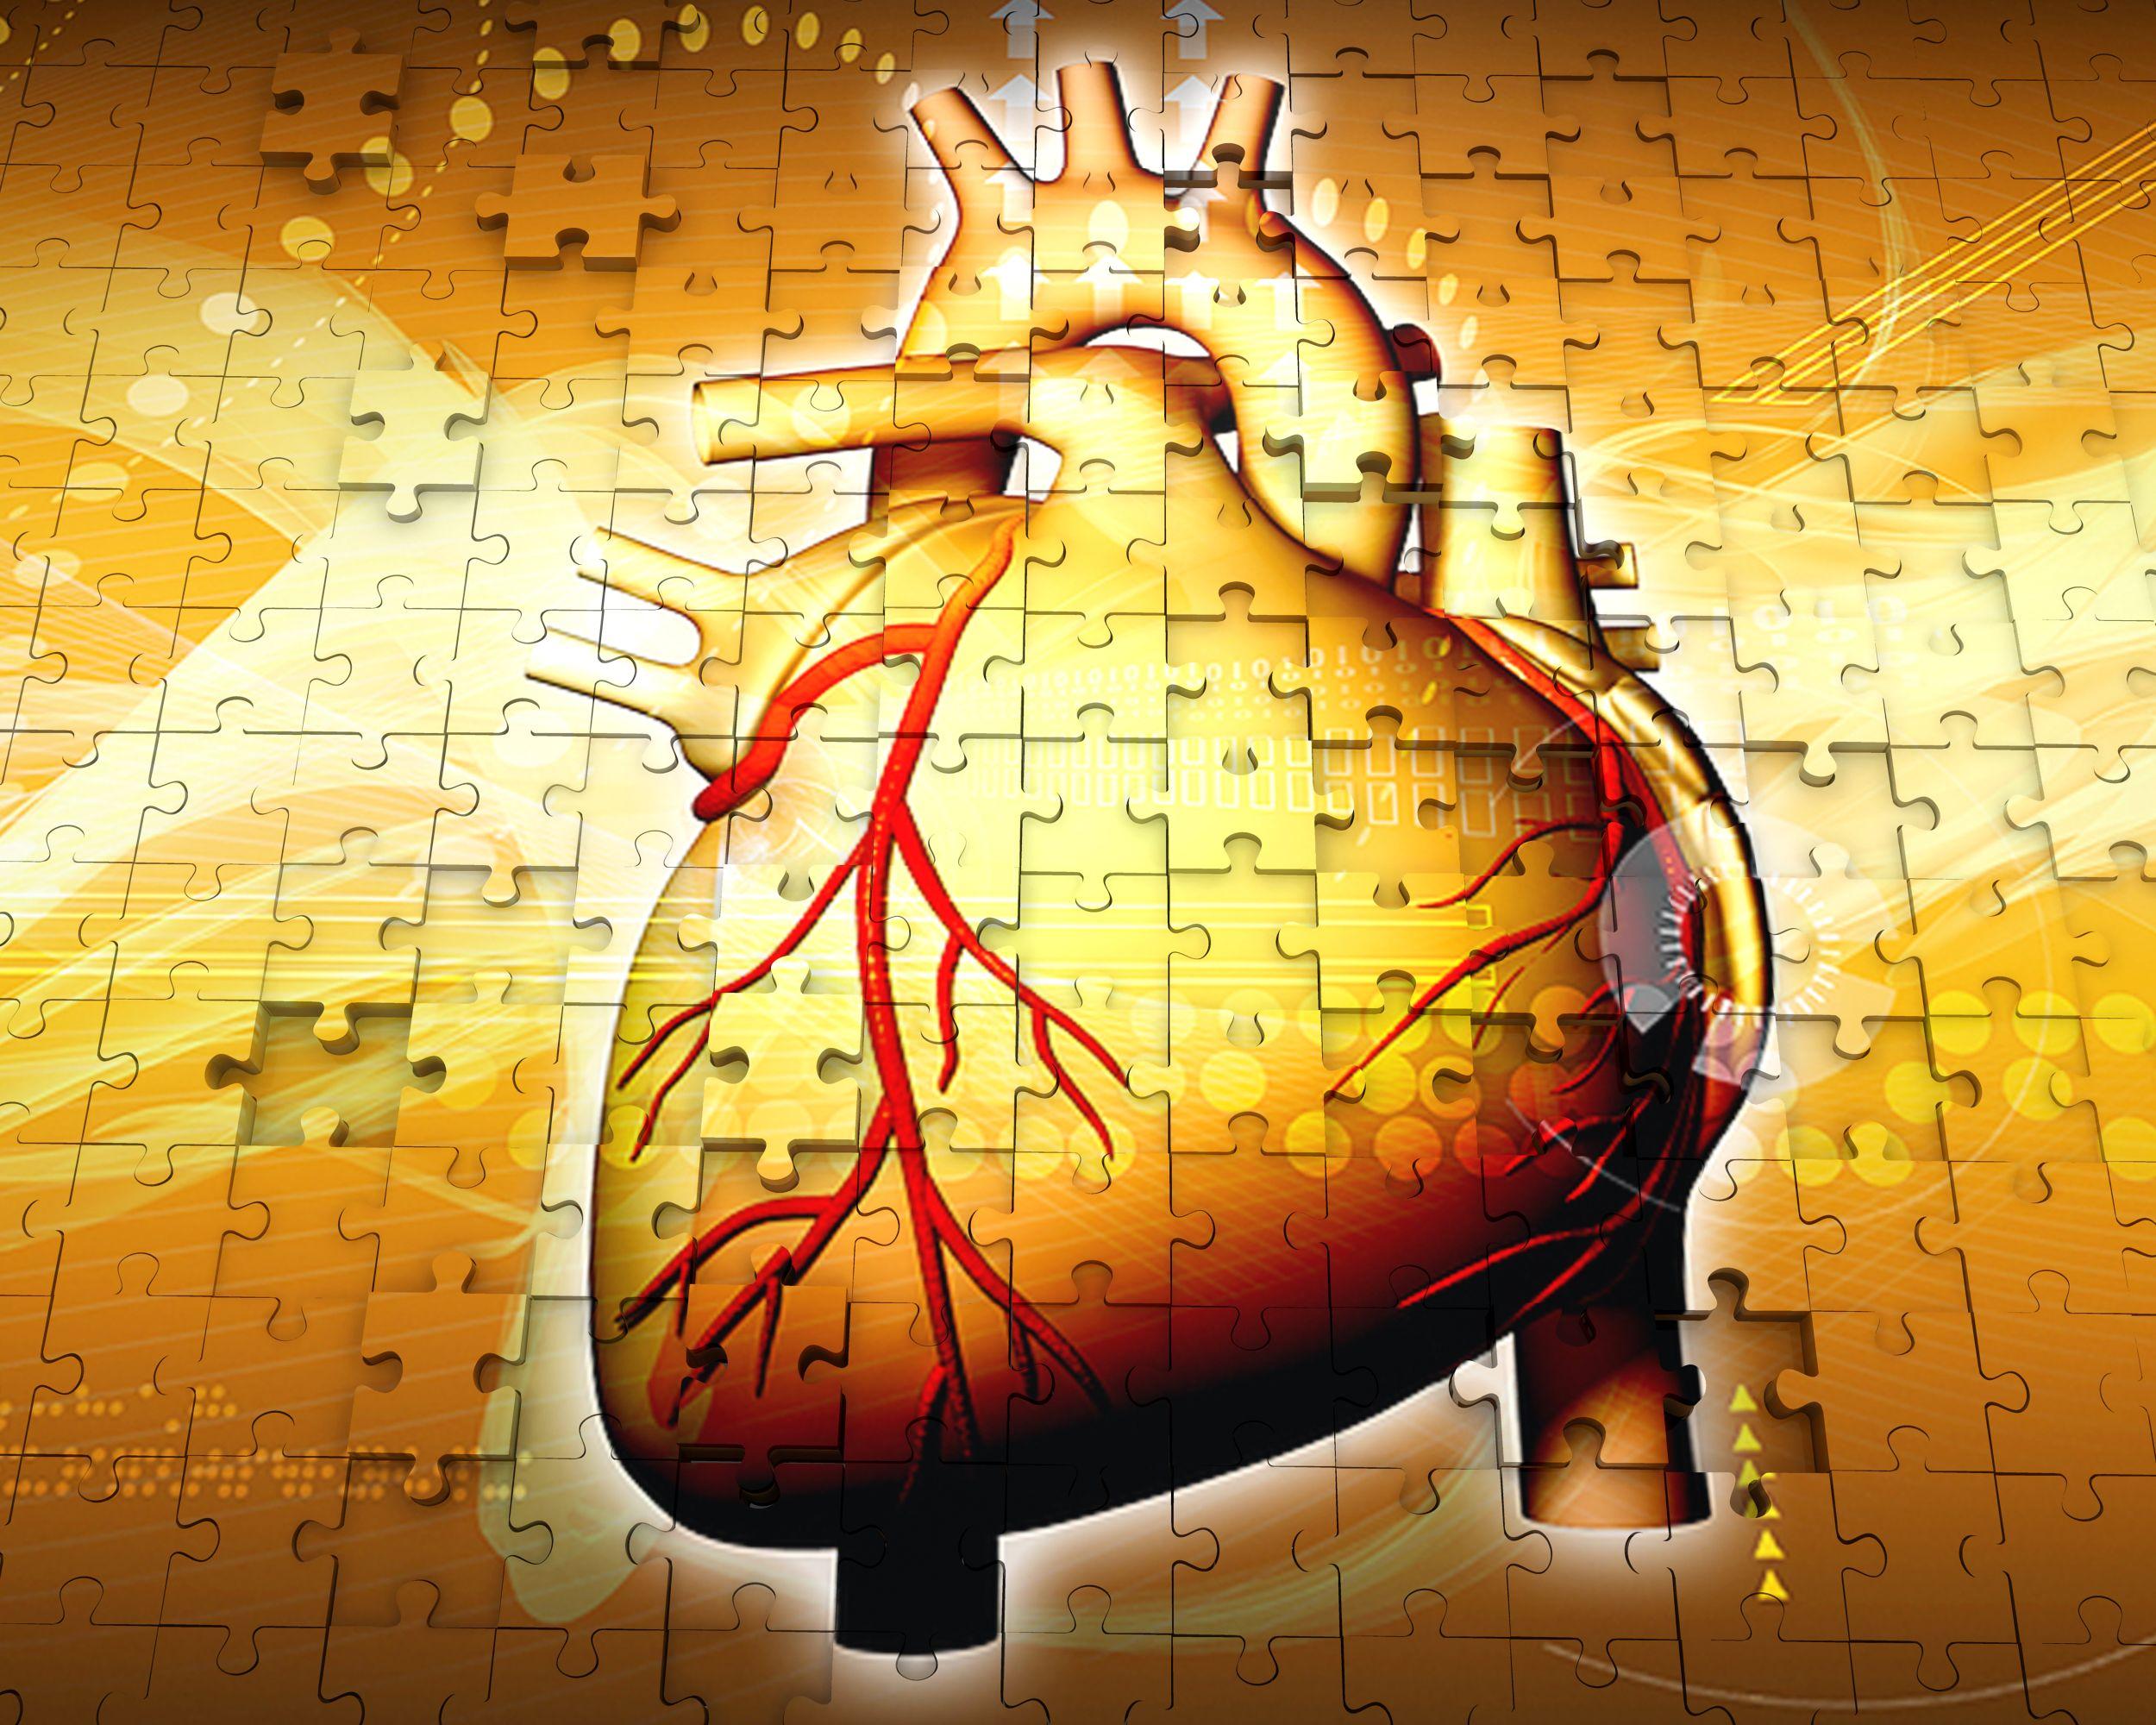 1114_anatomy_of_human_heart_on_puzzle_background_stock_photo_Slide01